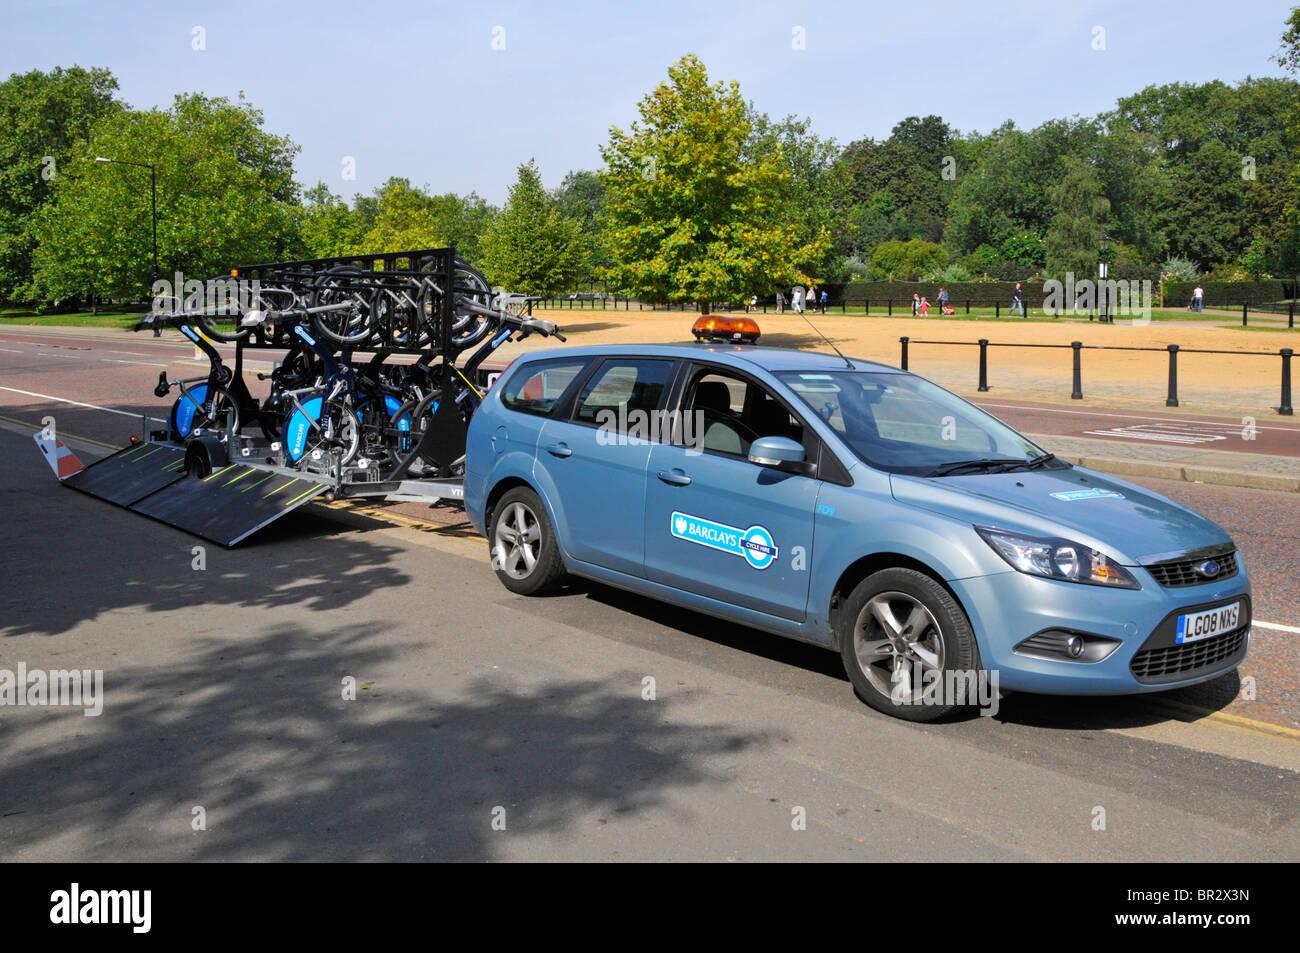 Barclays sponsored London bike hire scheme top up and maintenance ...